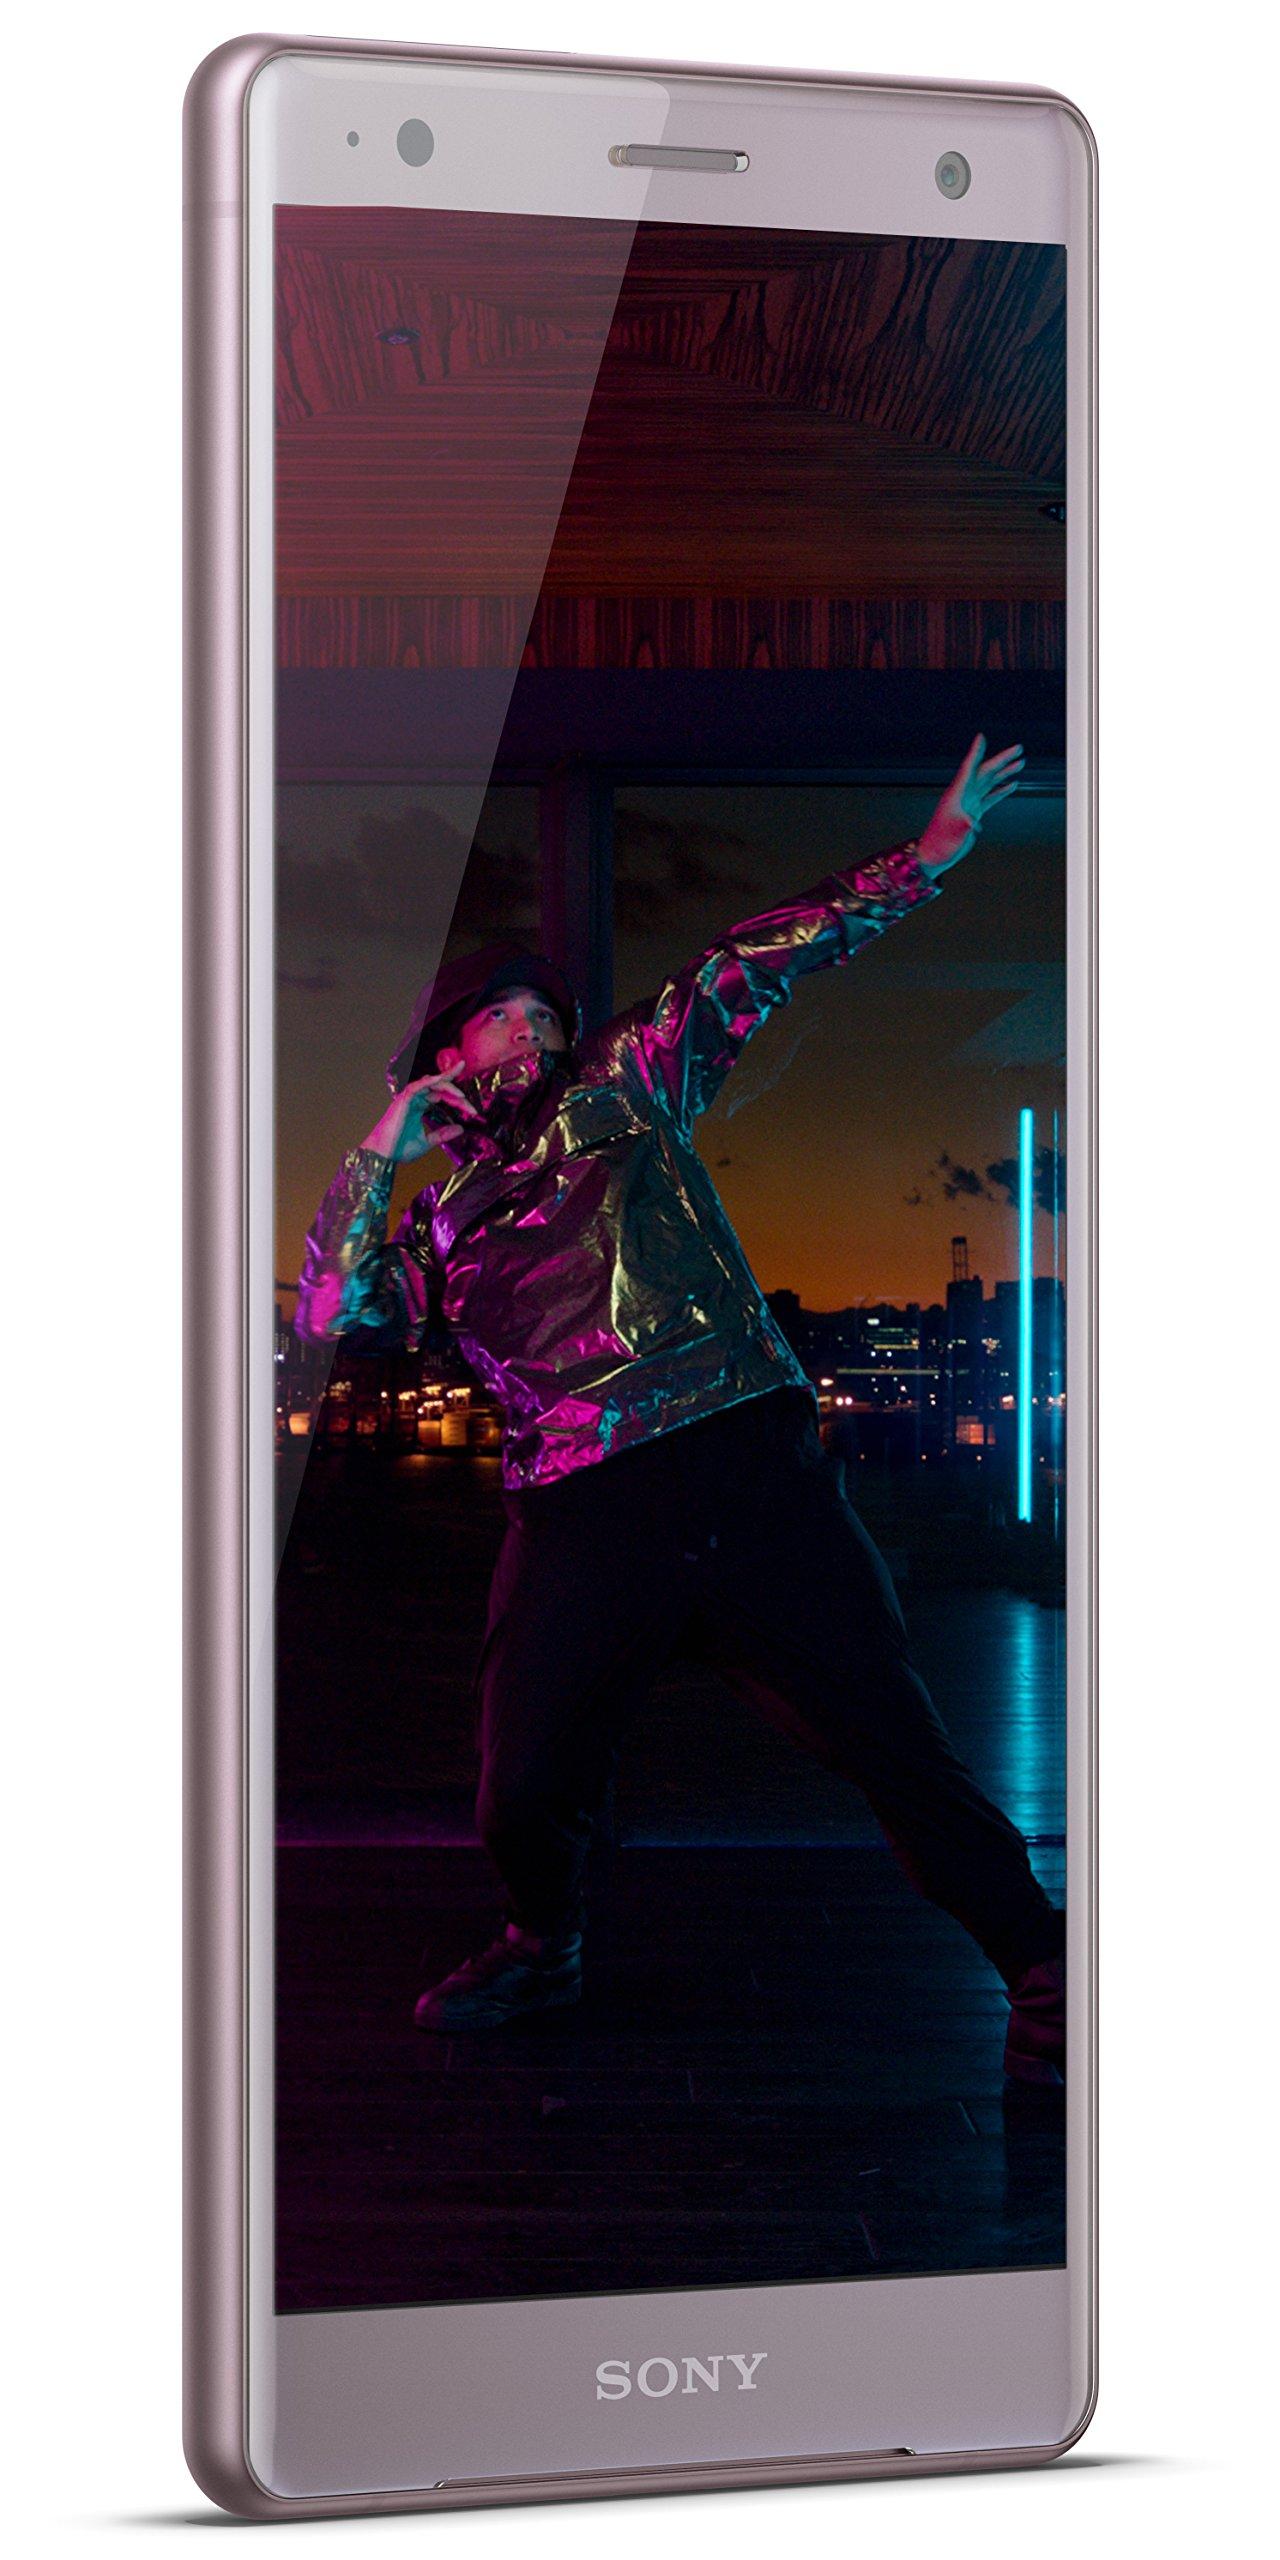 Sony Xperia XZ2 Unlocked Smartphone - 5.7'' Screen - 64GB - Ash Pink (US Warranty)